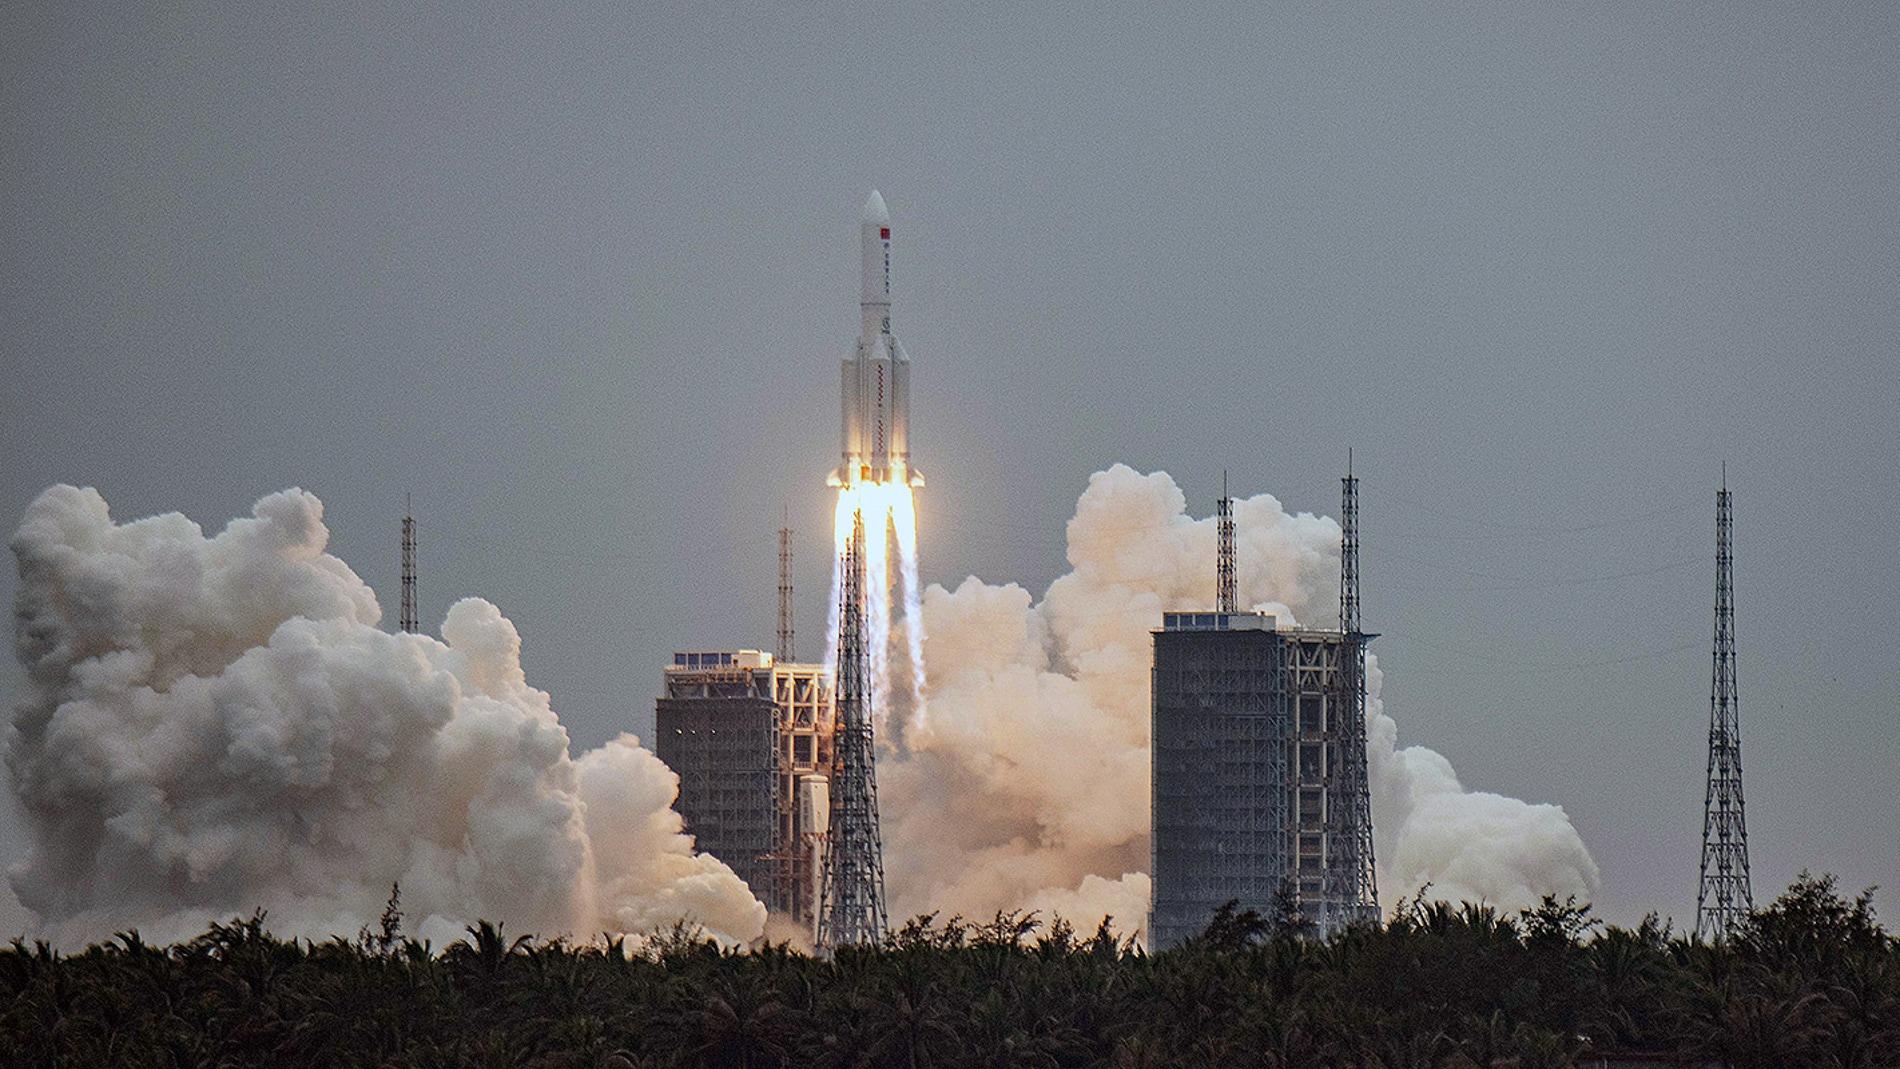 Espana se suma al seguimiento del cohete chino durante su caida a la Tierra este fin de semana